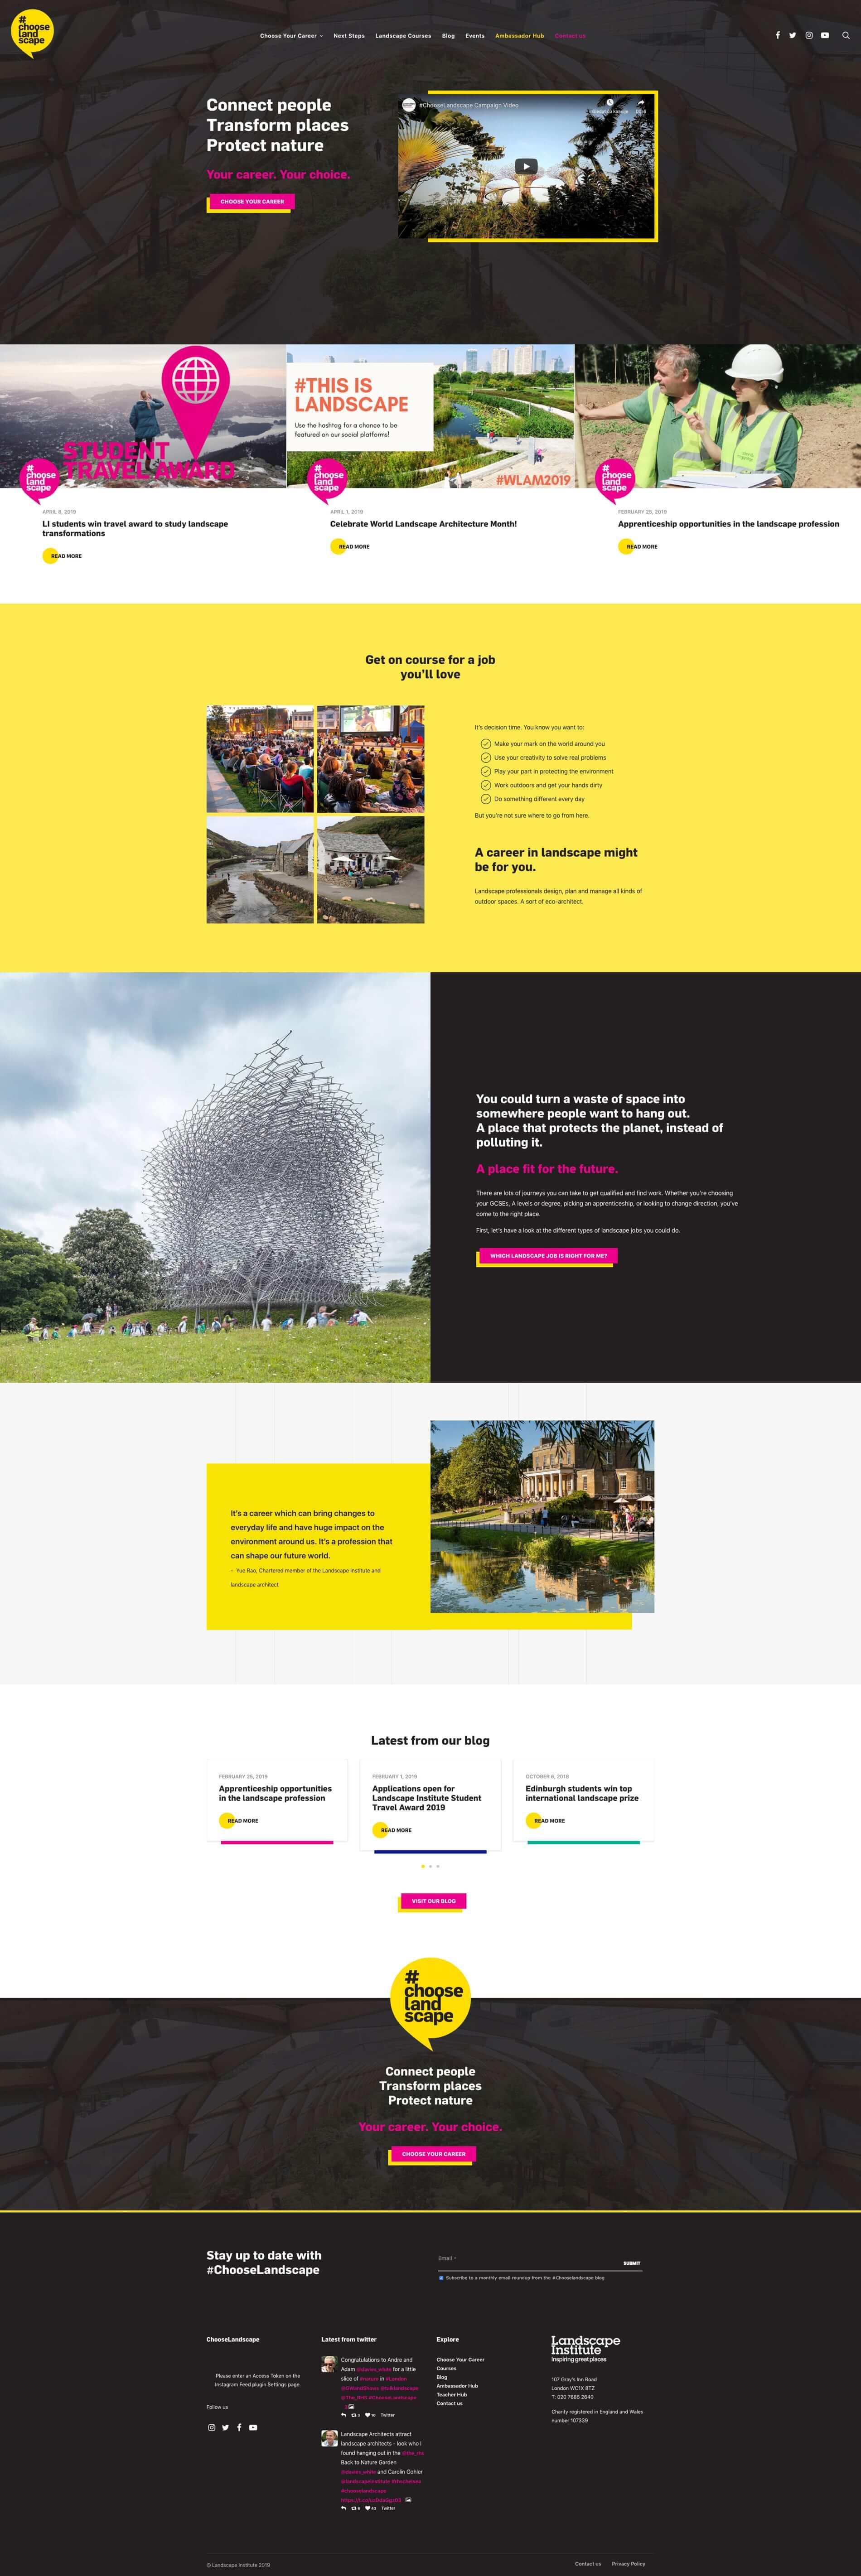 Chooselandscape home page case study